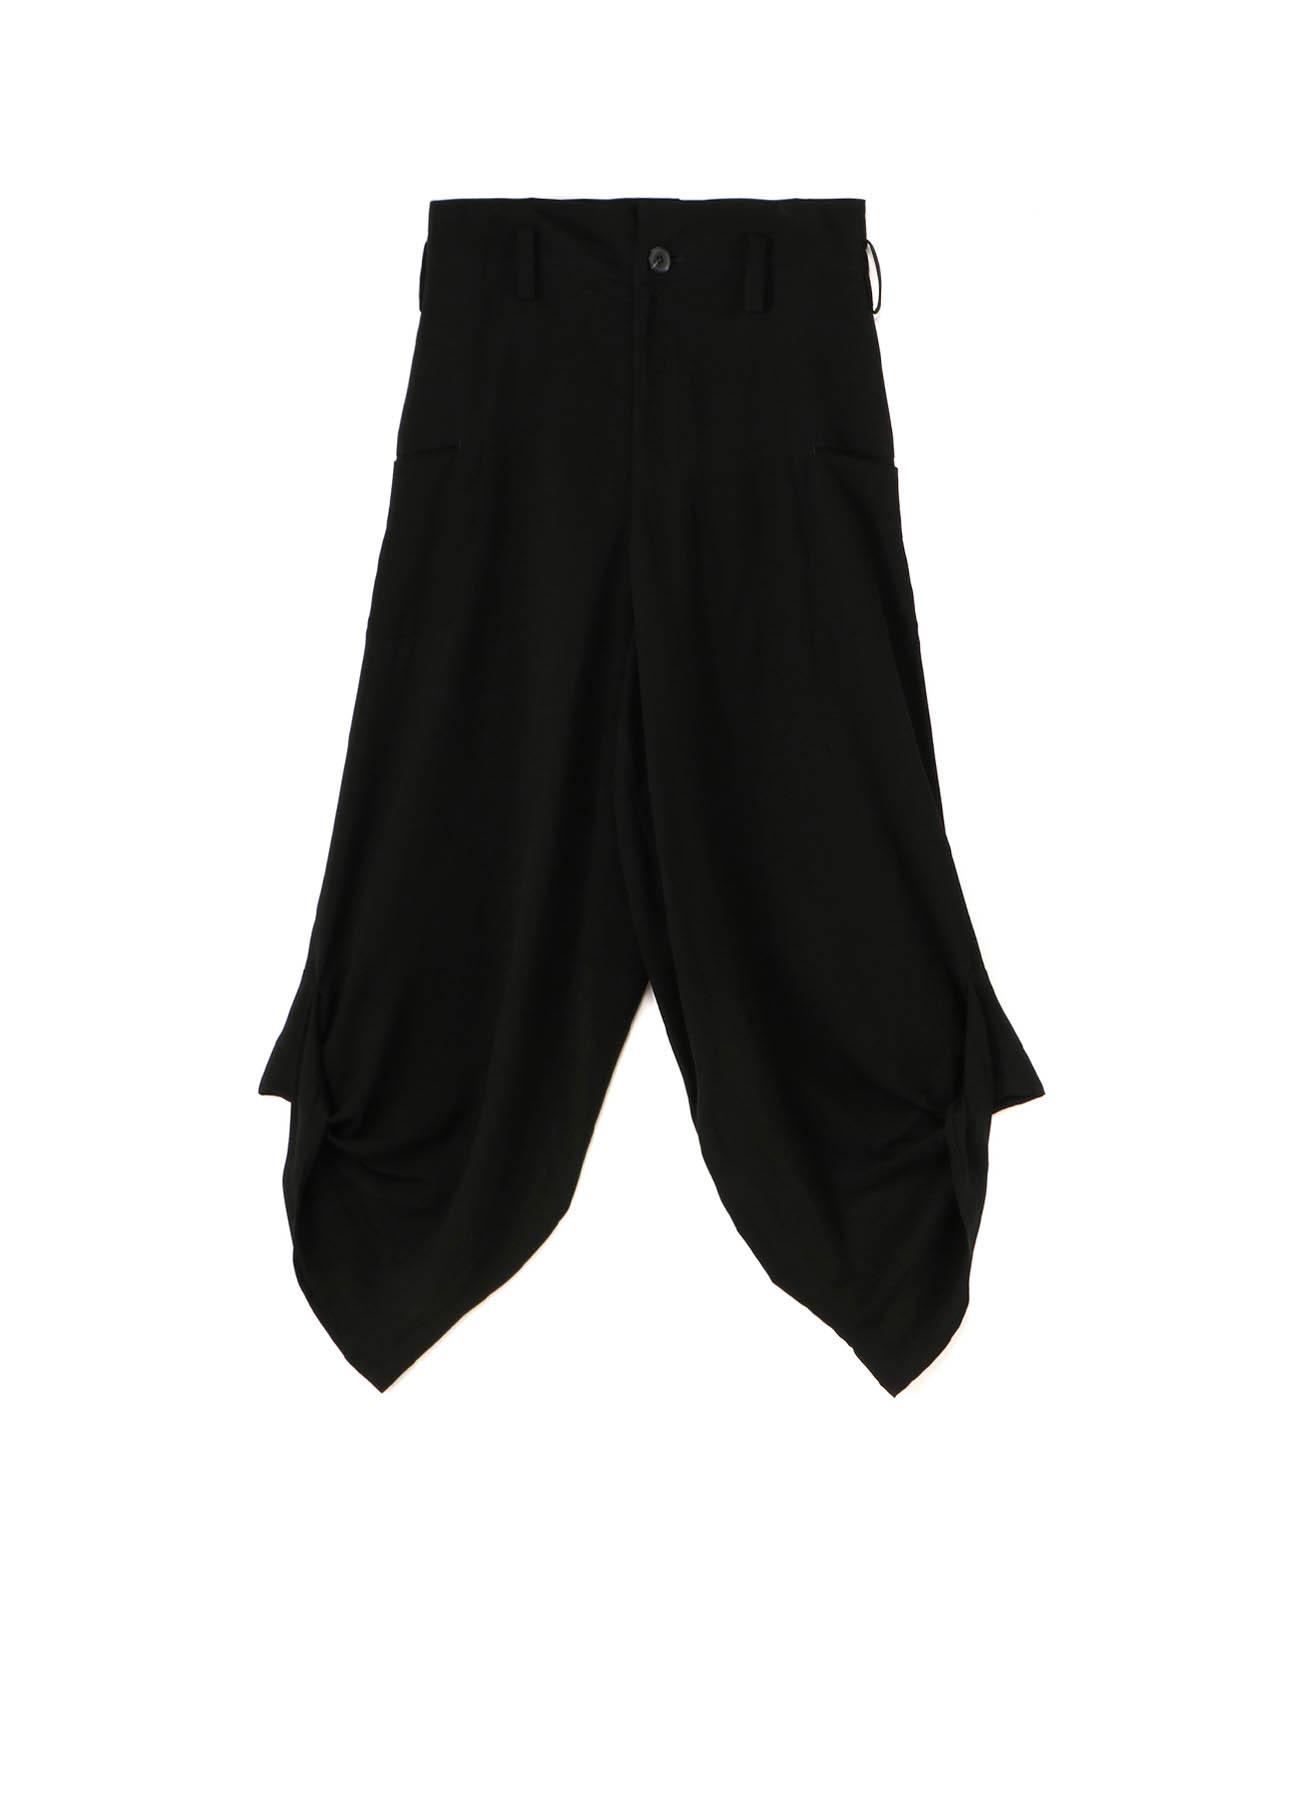 Ten/Cu Tussah Roll Up Pants